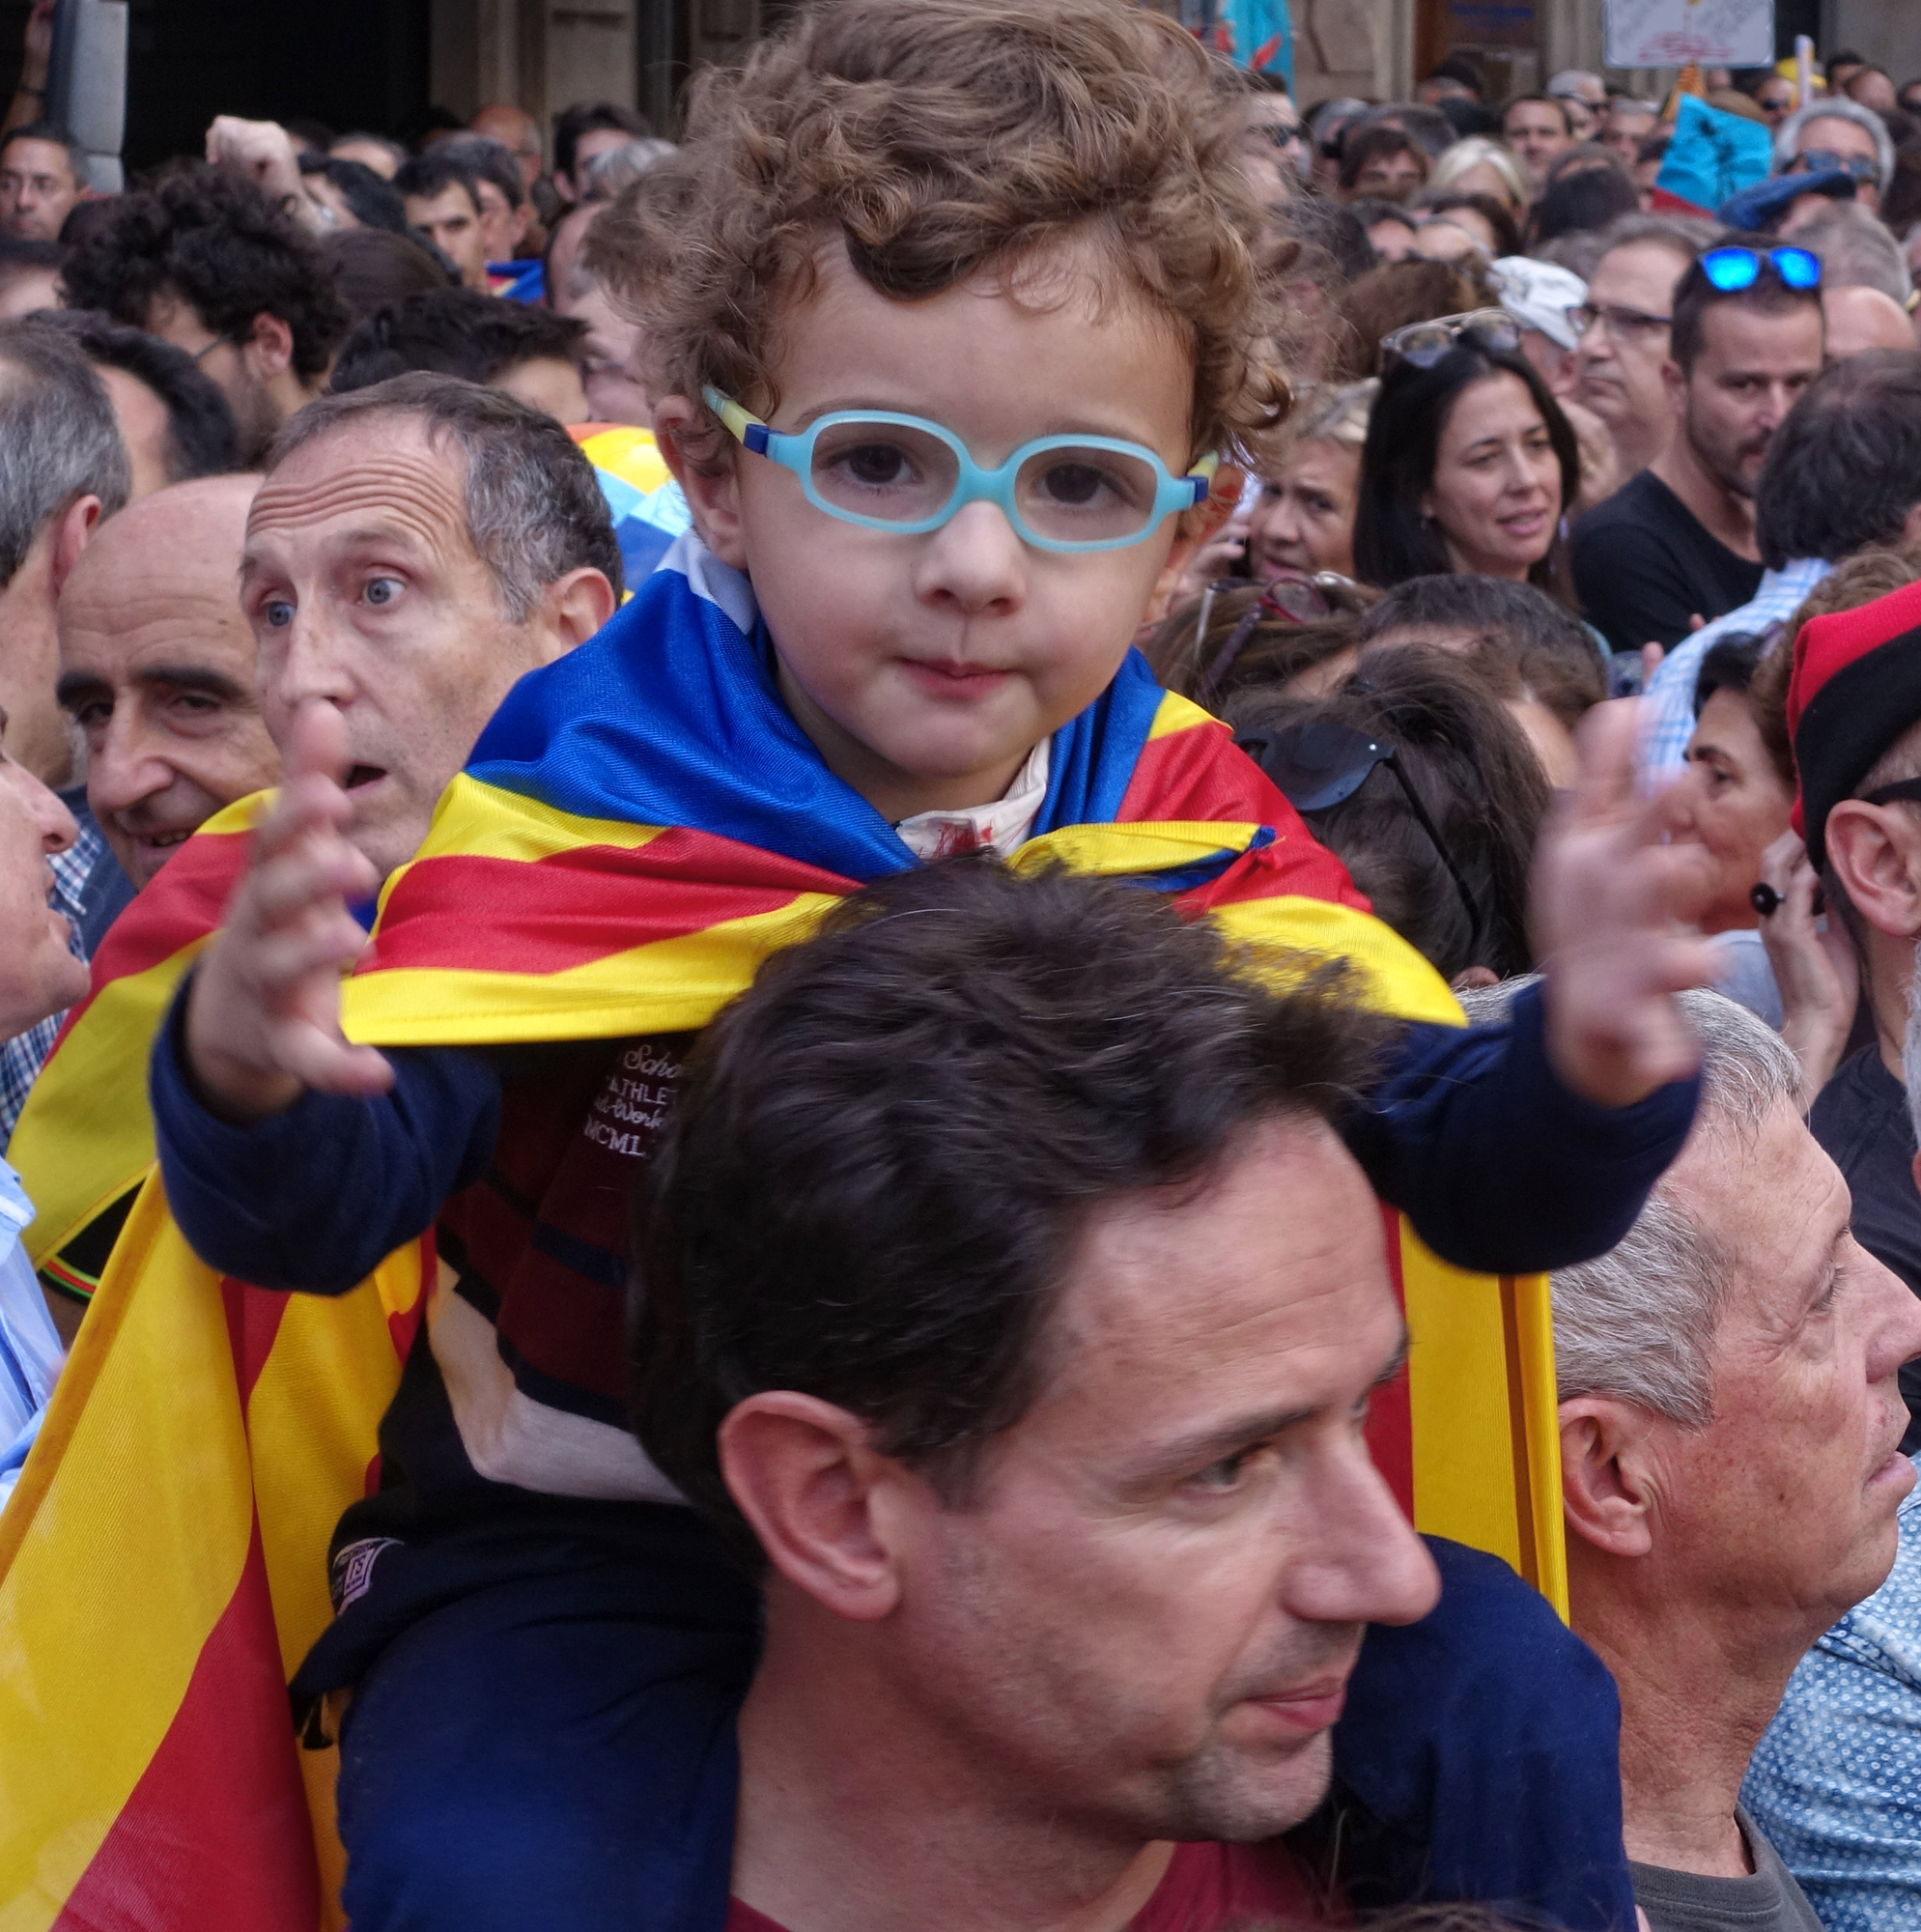 Manifestacion, #2. Barcelona, Catalunya, Espanya, 2017